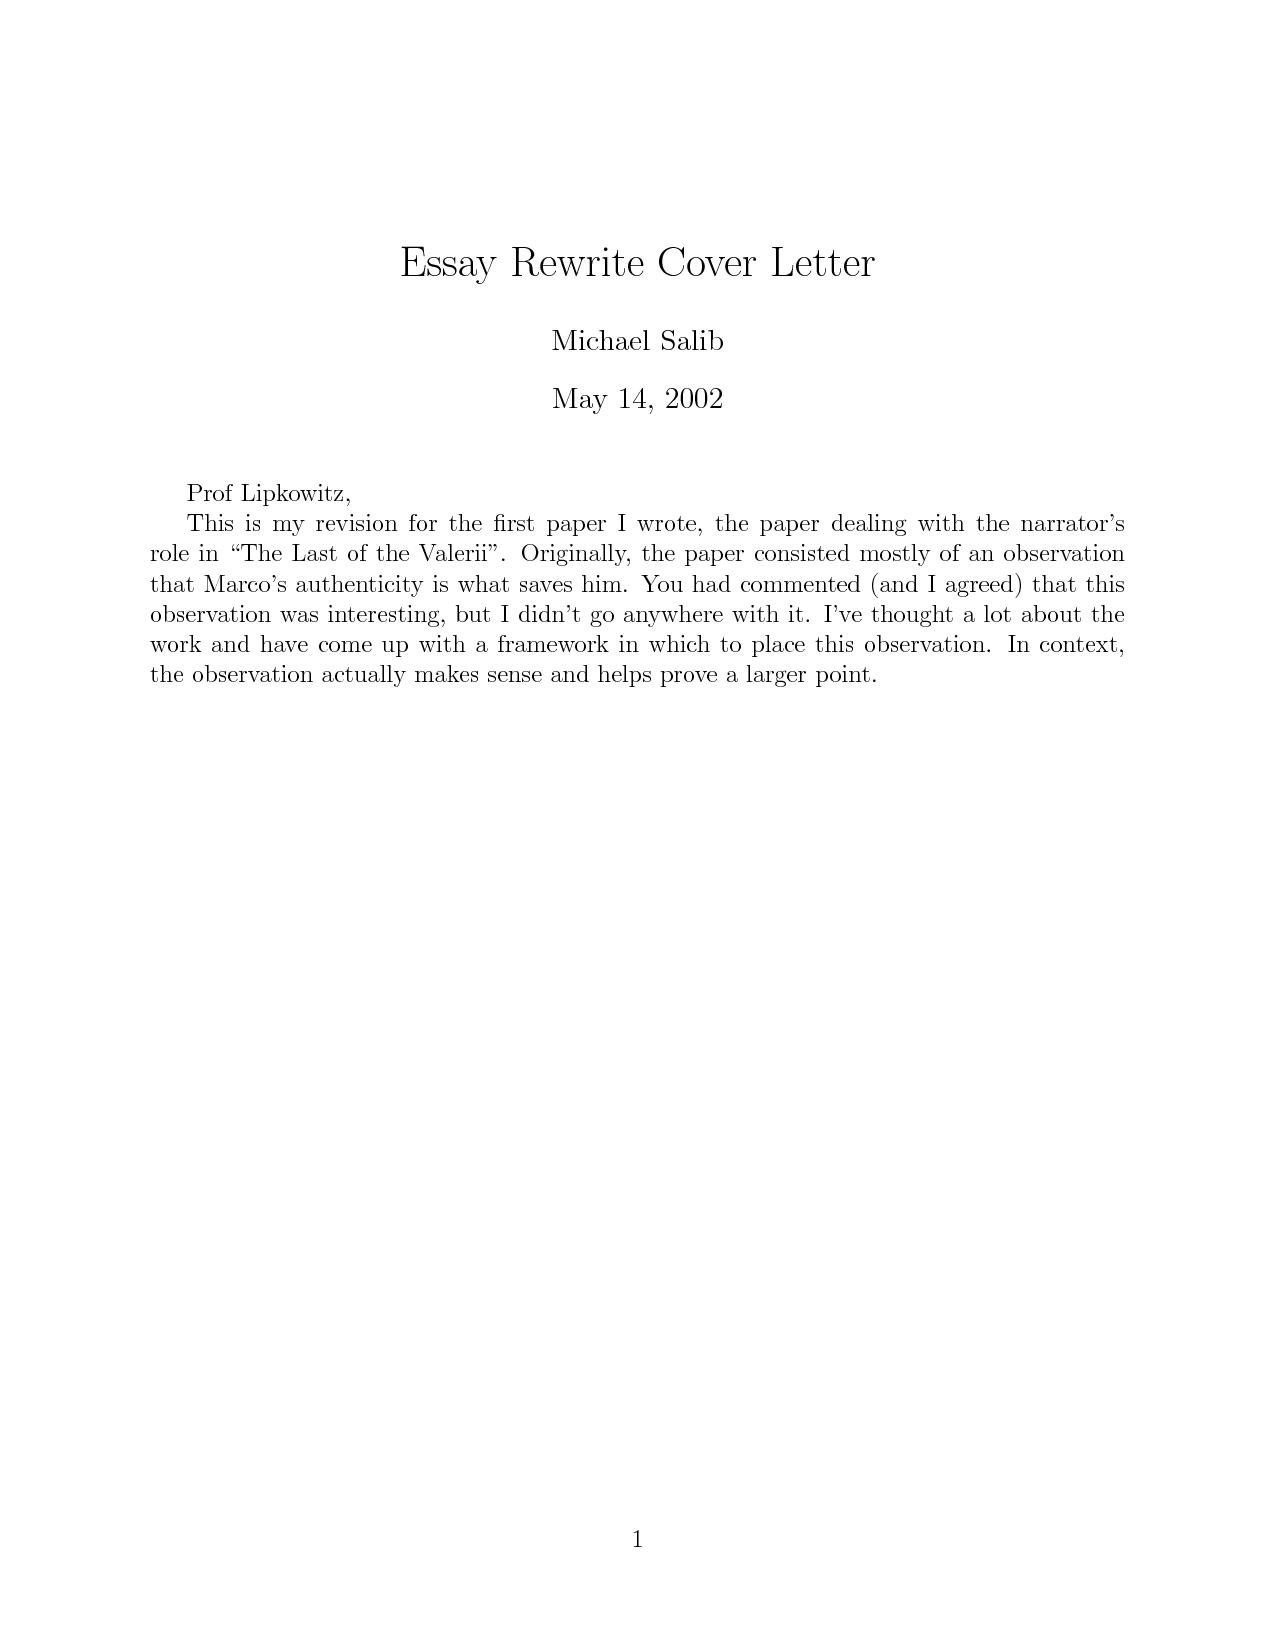 essay cover letter samples